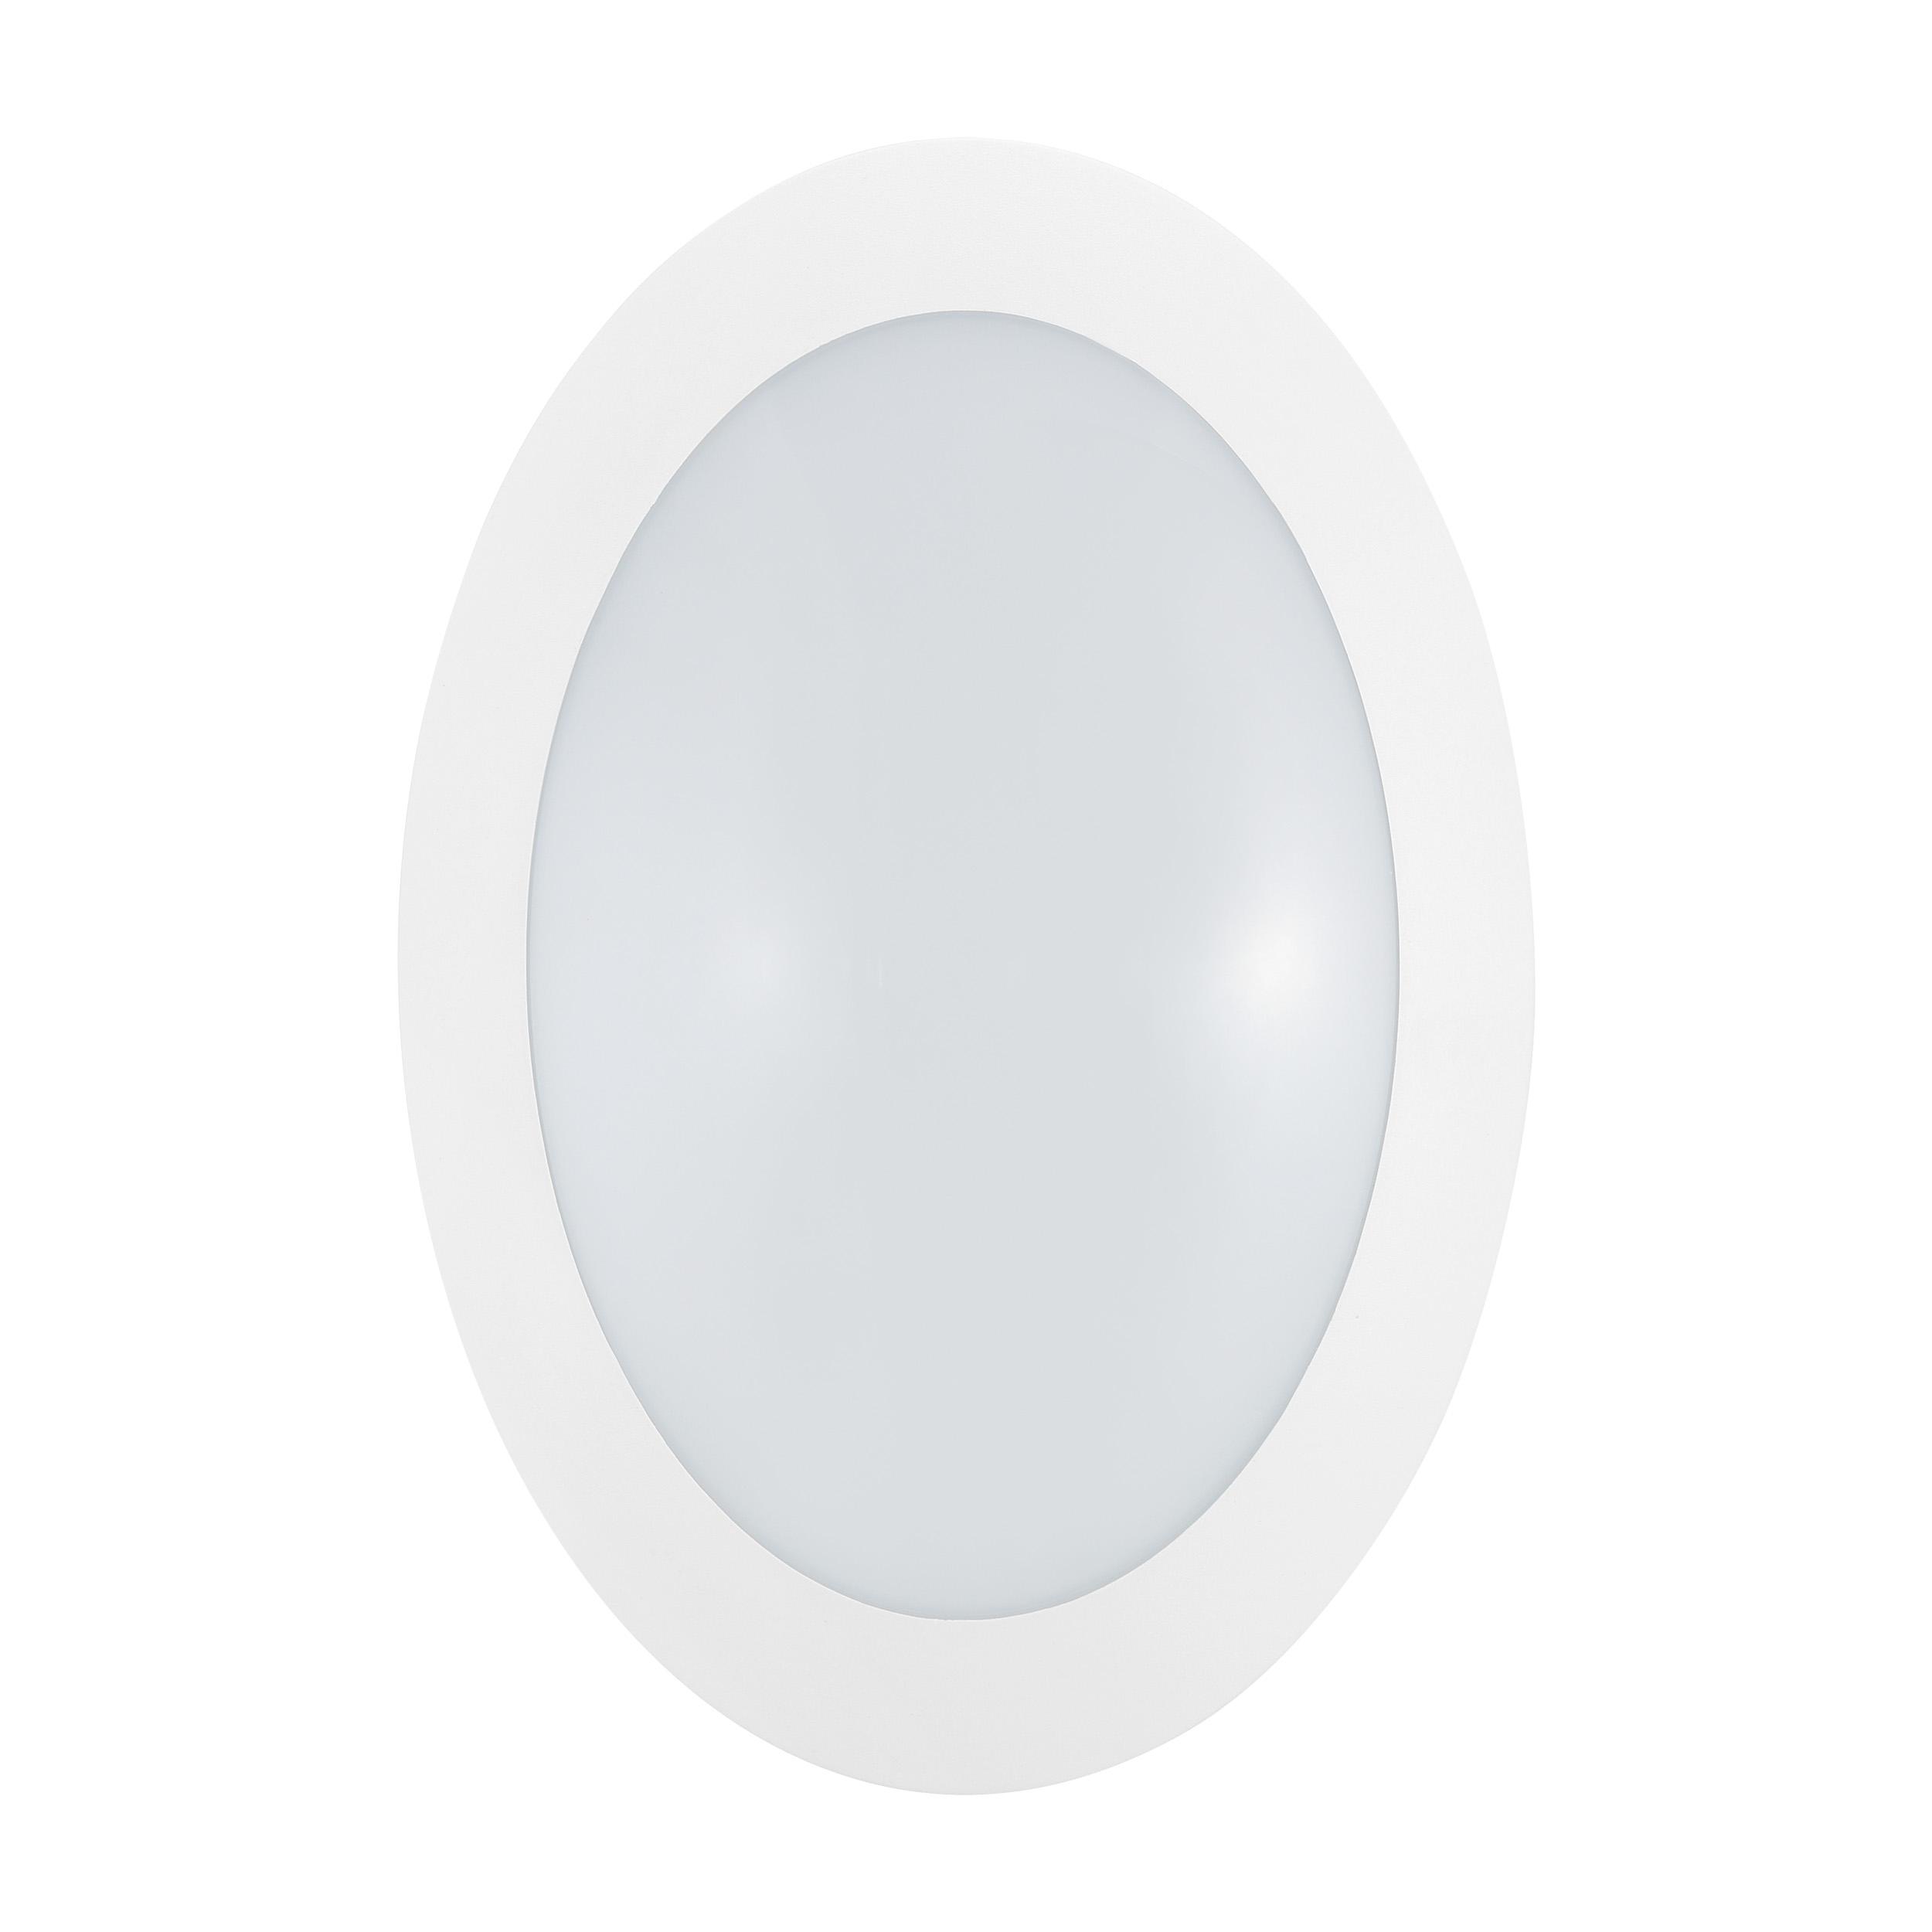 1 Stk Bellaria Wandaufbauleuchte oval 6W 3000K weiß IP66 LI62211---